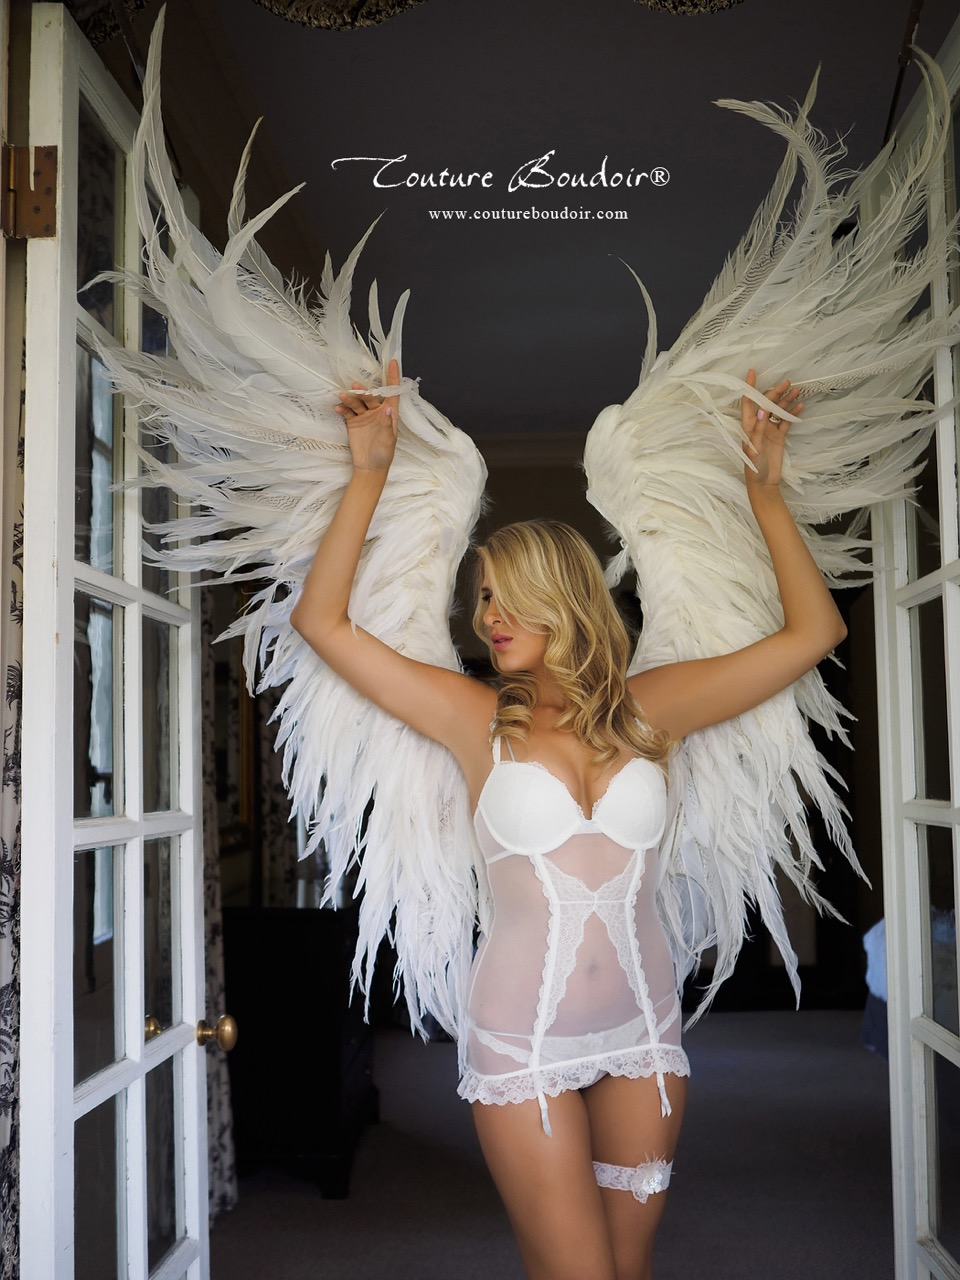 Messy Angel - $1500